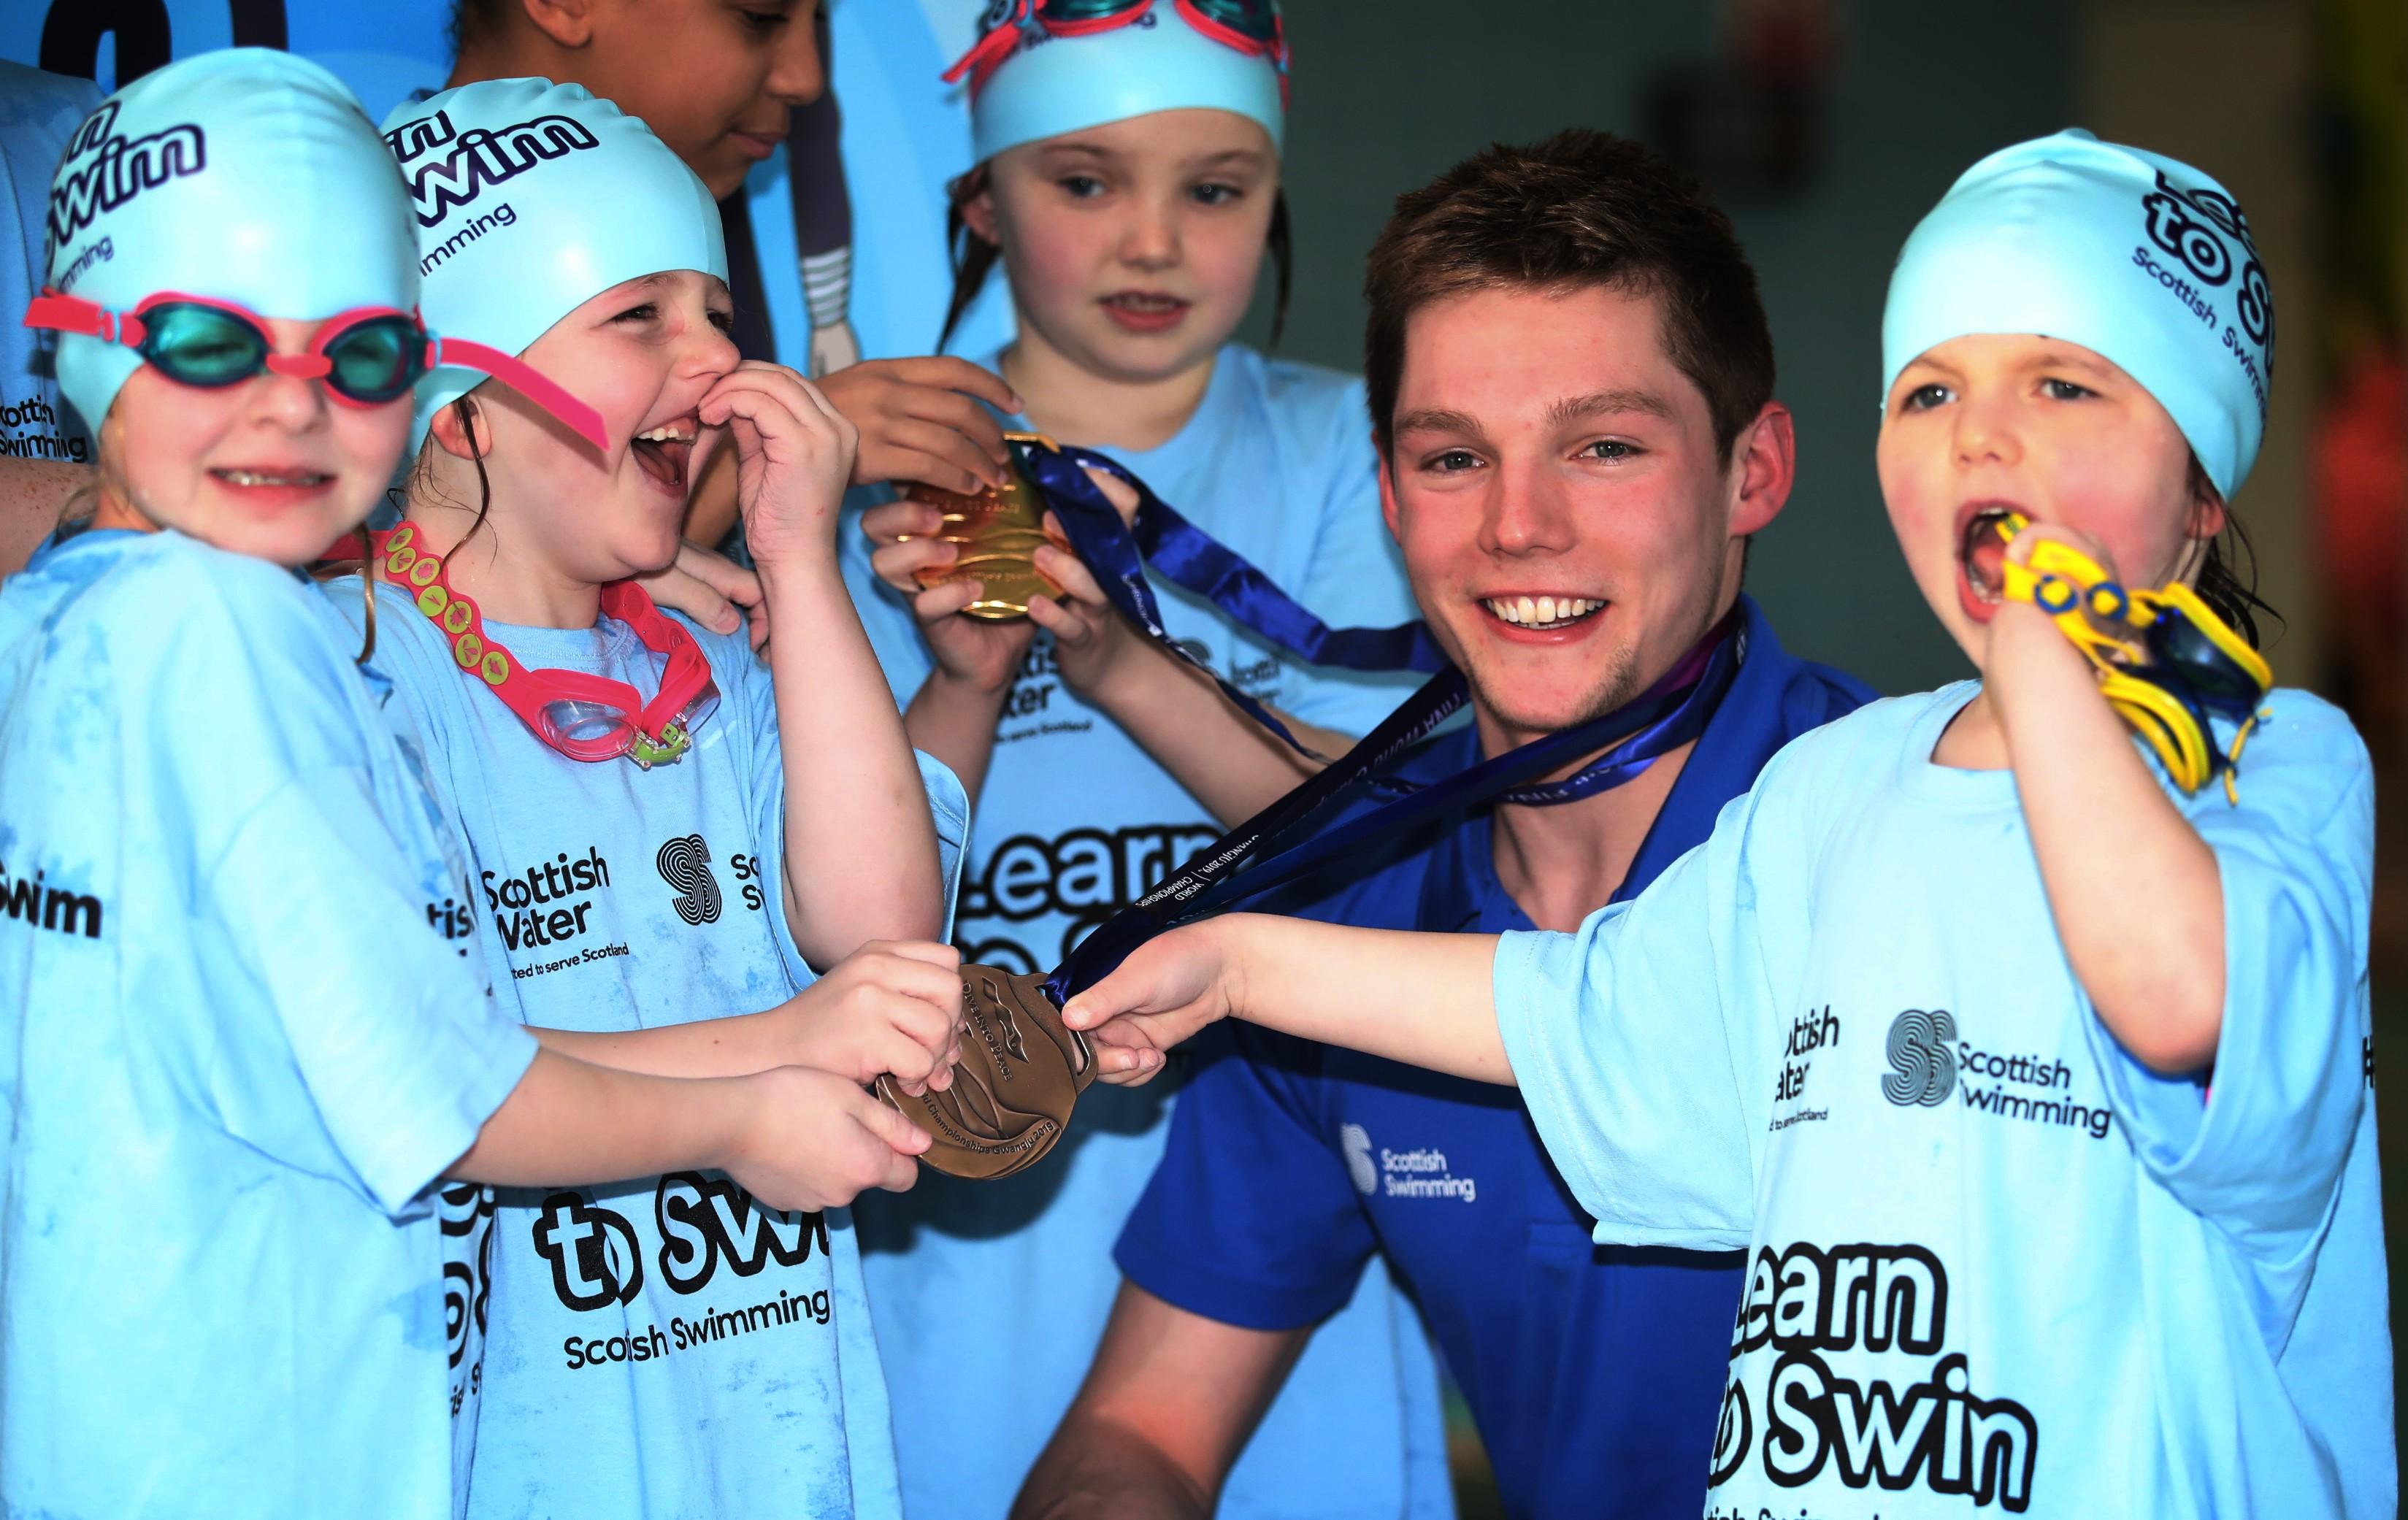 Scot swim star Duncan Scott with children on Learn to Swim programme - Public Sector PR